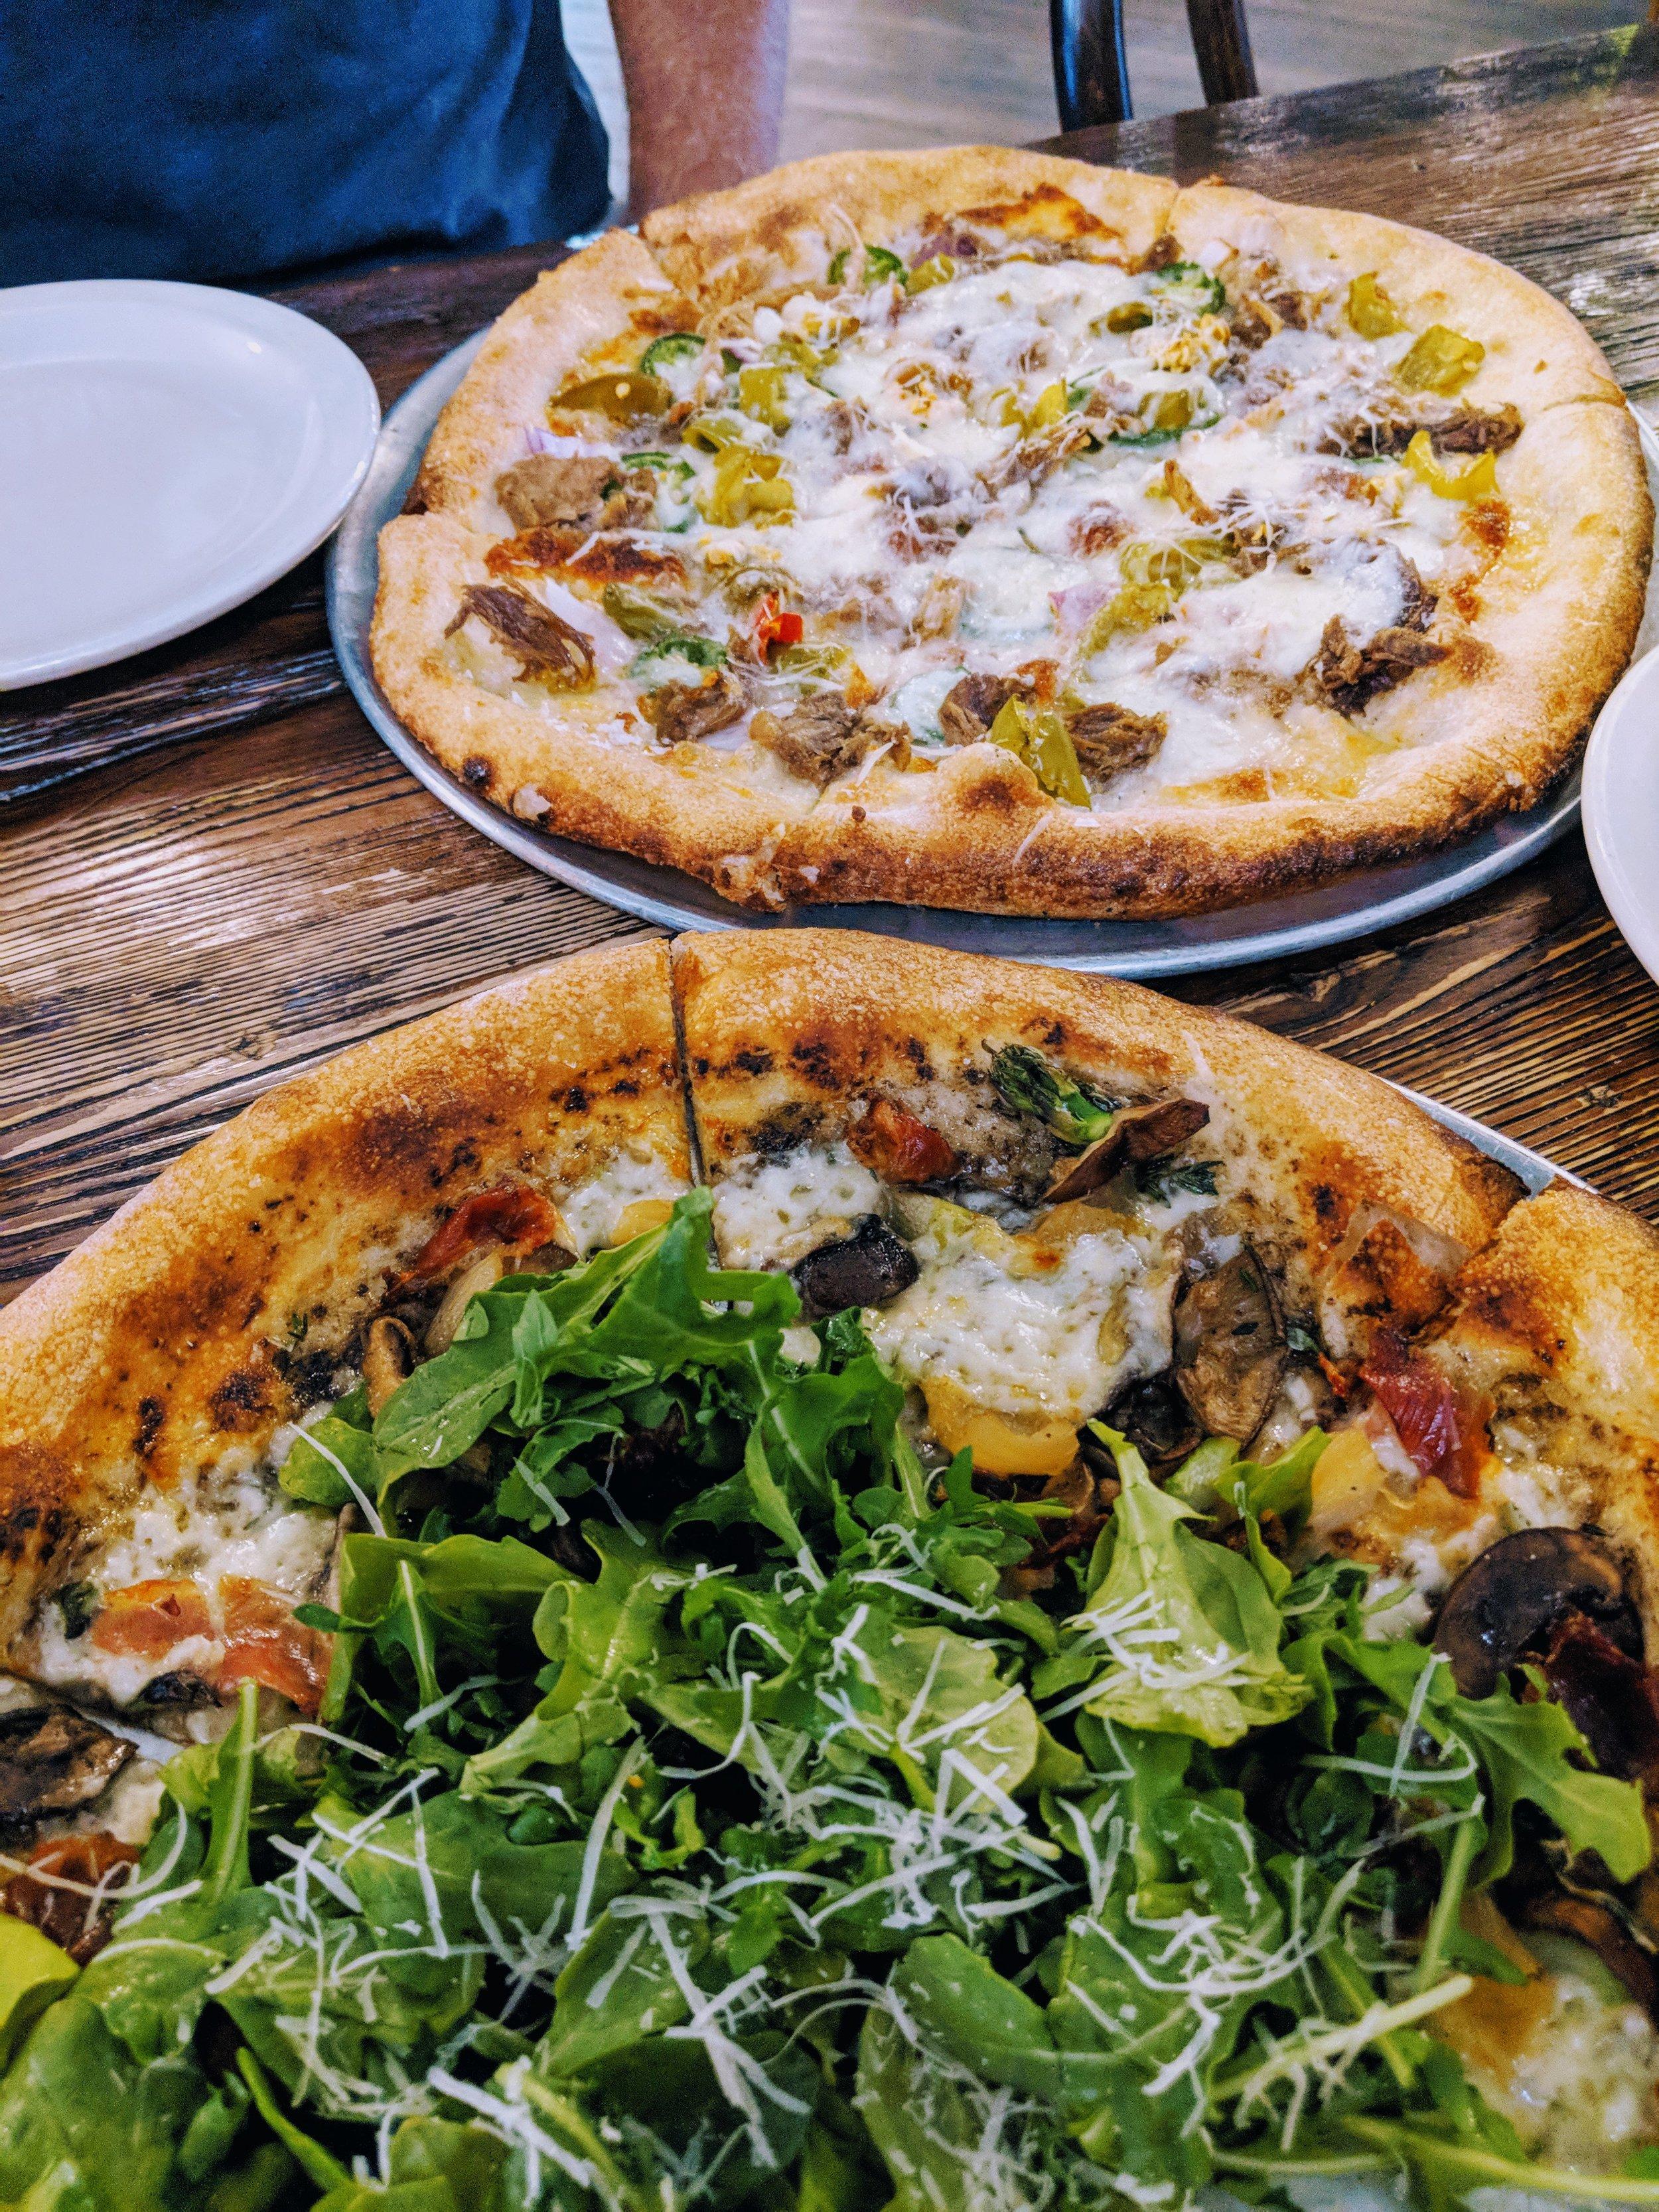 Fabulous pizzas!